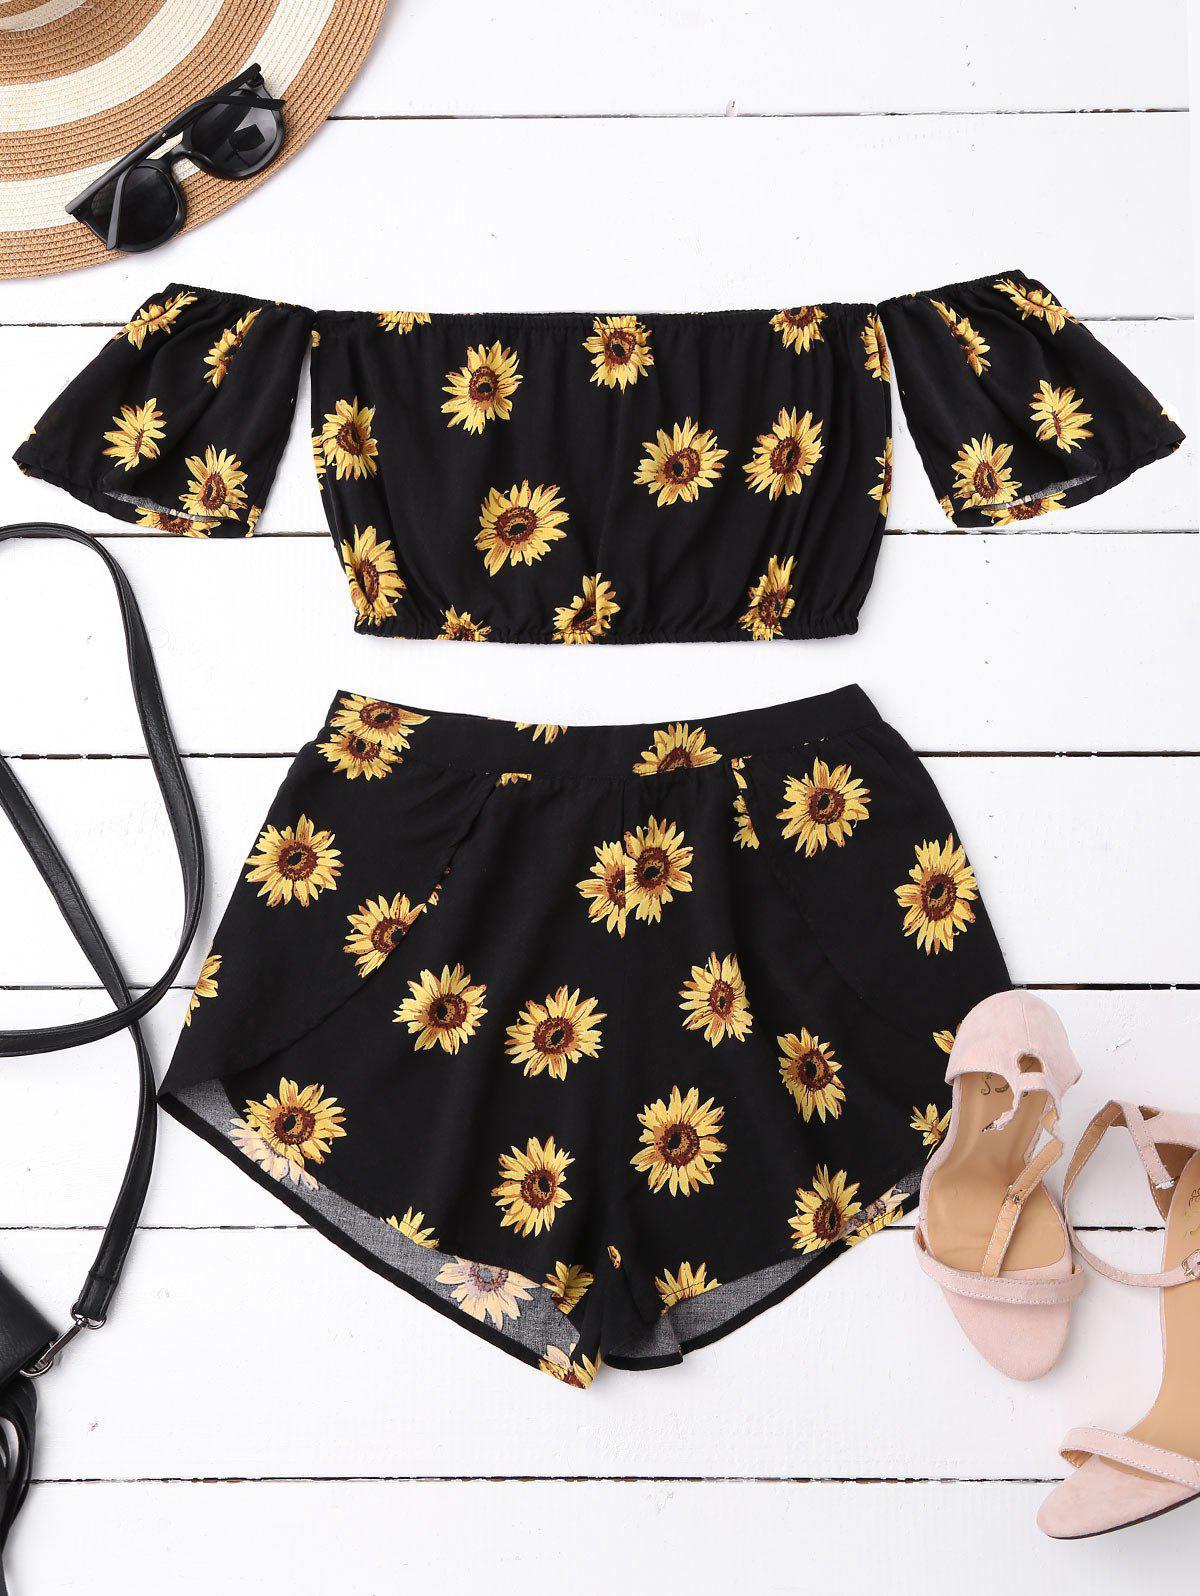 Off Shoulder Crop Top and Sunflower Shorts, Black